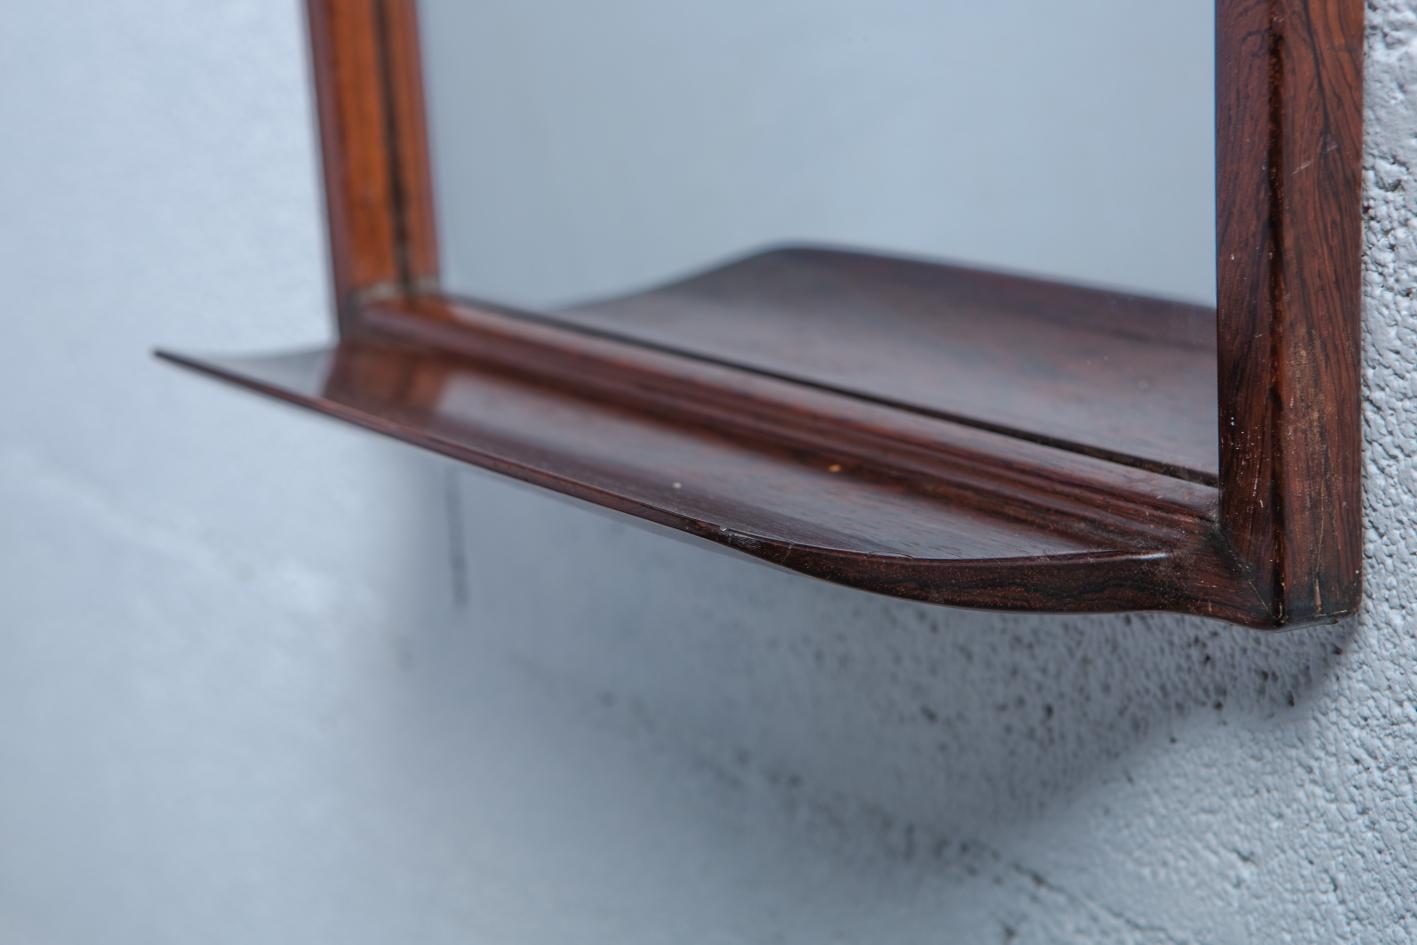 Rosewood Mirror by Uno & Östen Kristiansson for Luxus - Carved shelf detail